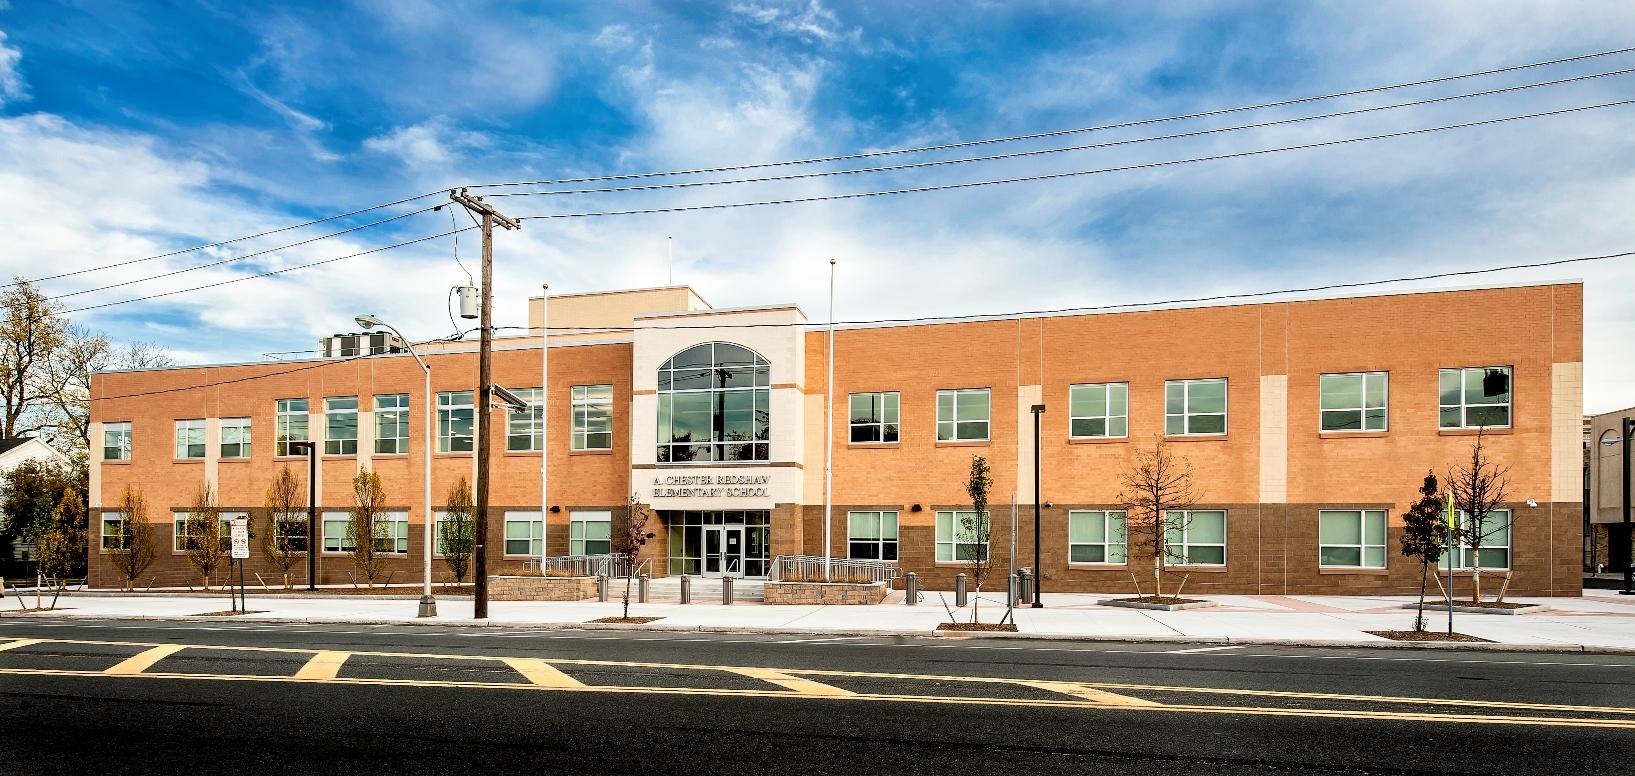 A. Chester Redshaw Elementary Design-Build School, New Brunswick, NJ